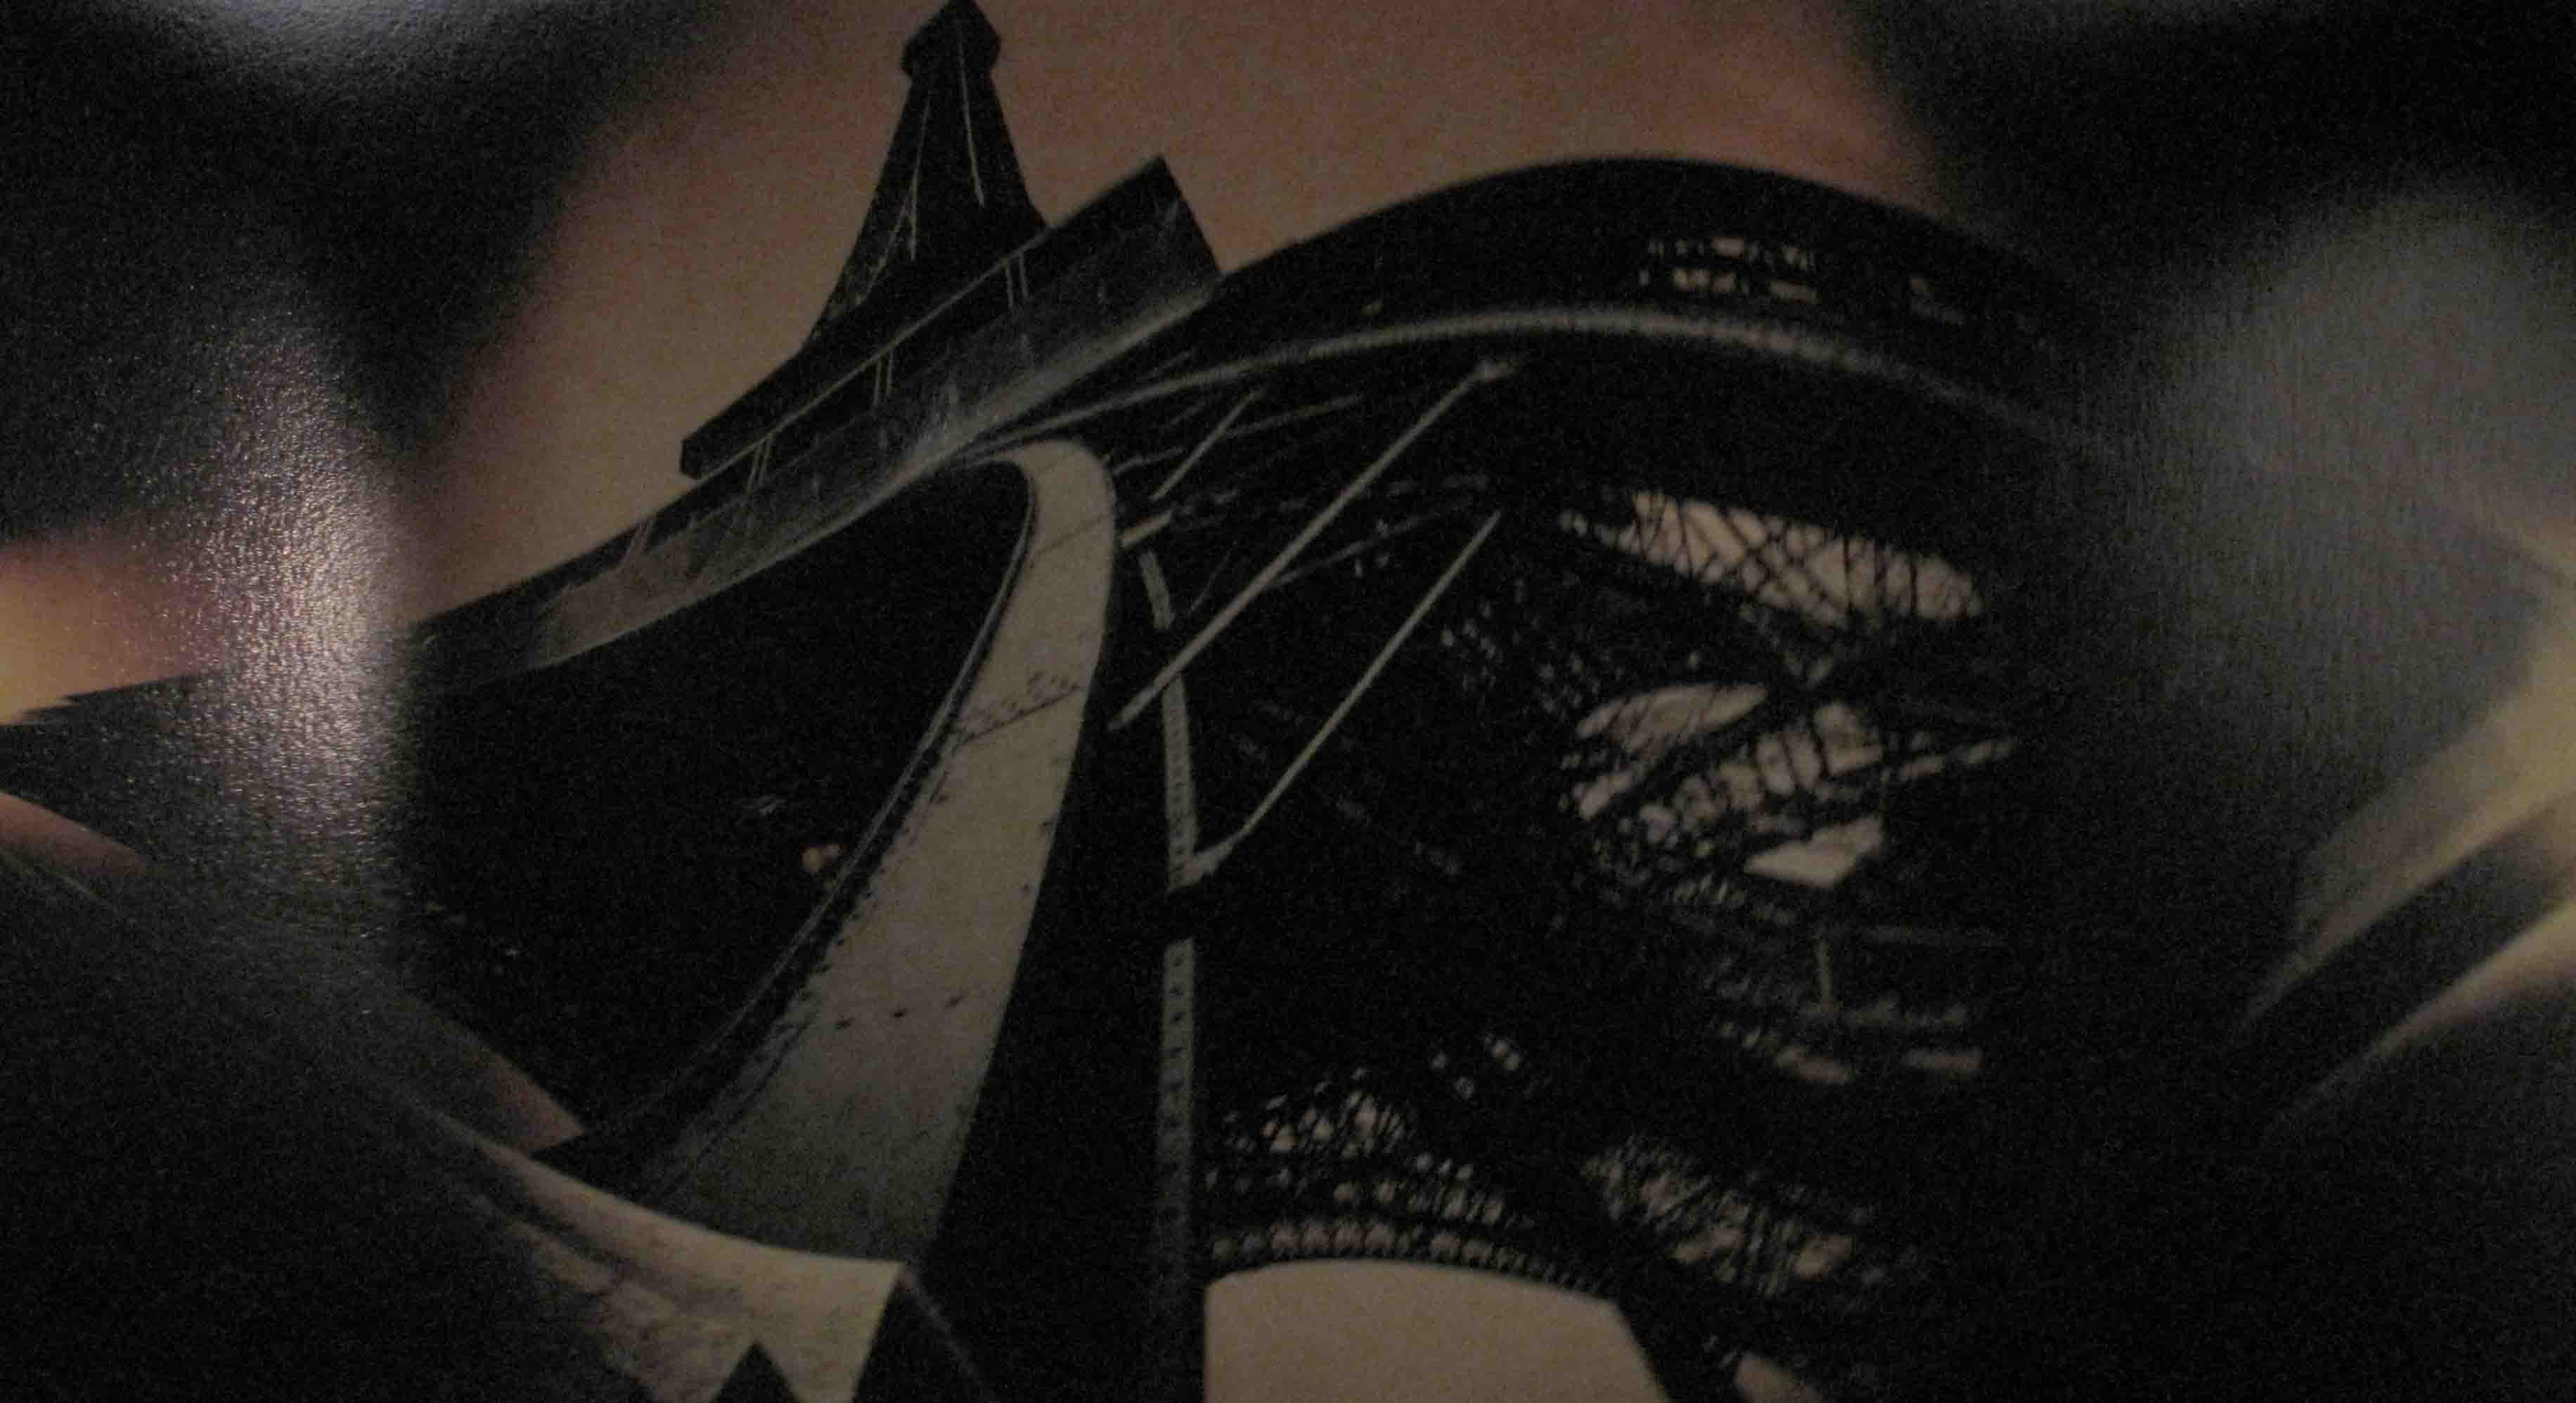 Eiffel Tower_Paris_1986<br/>